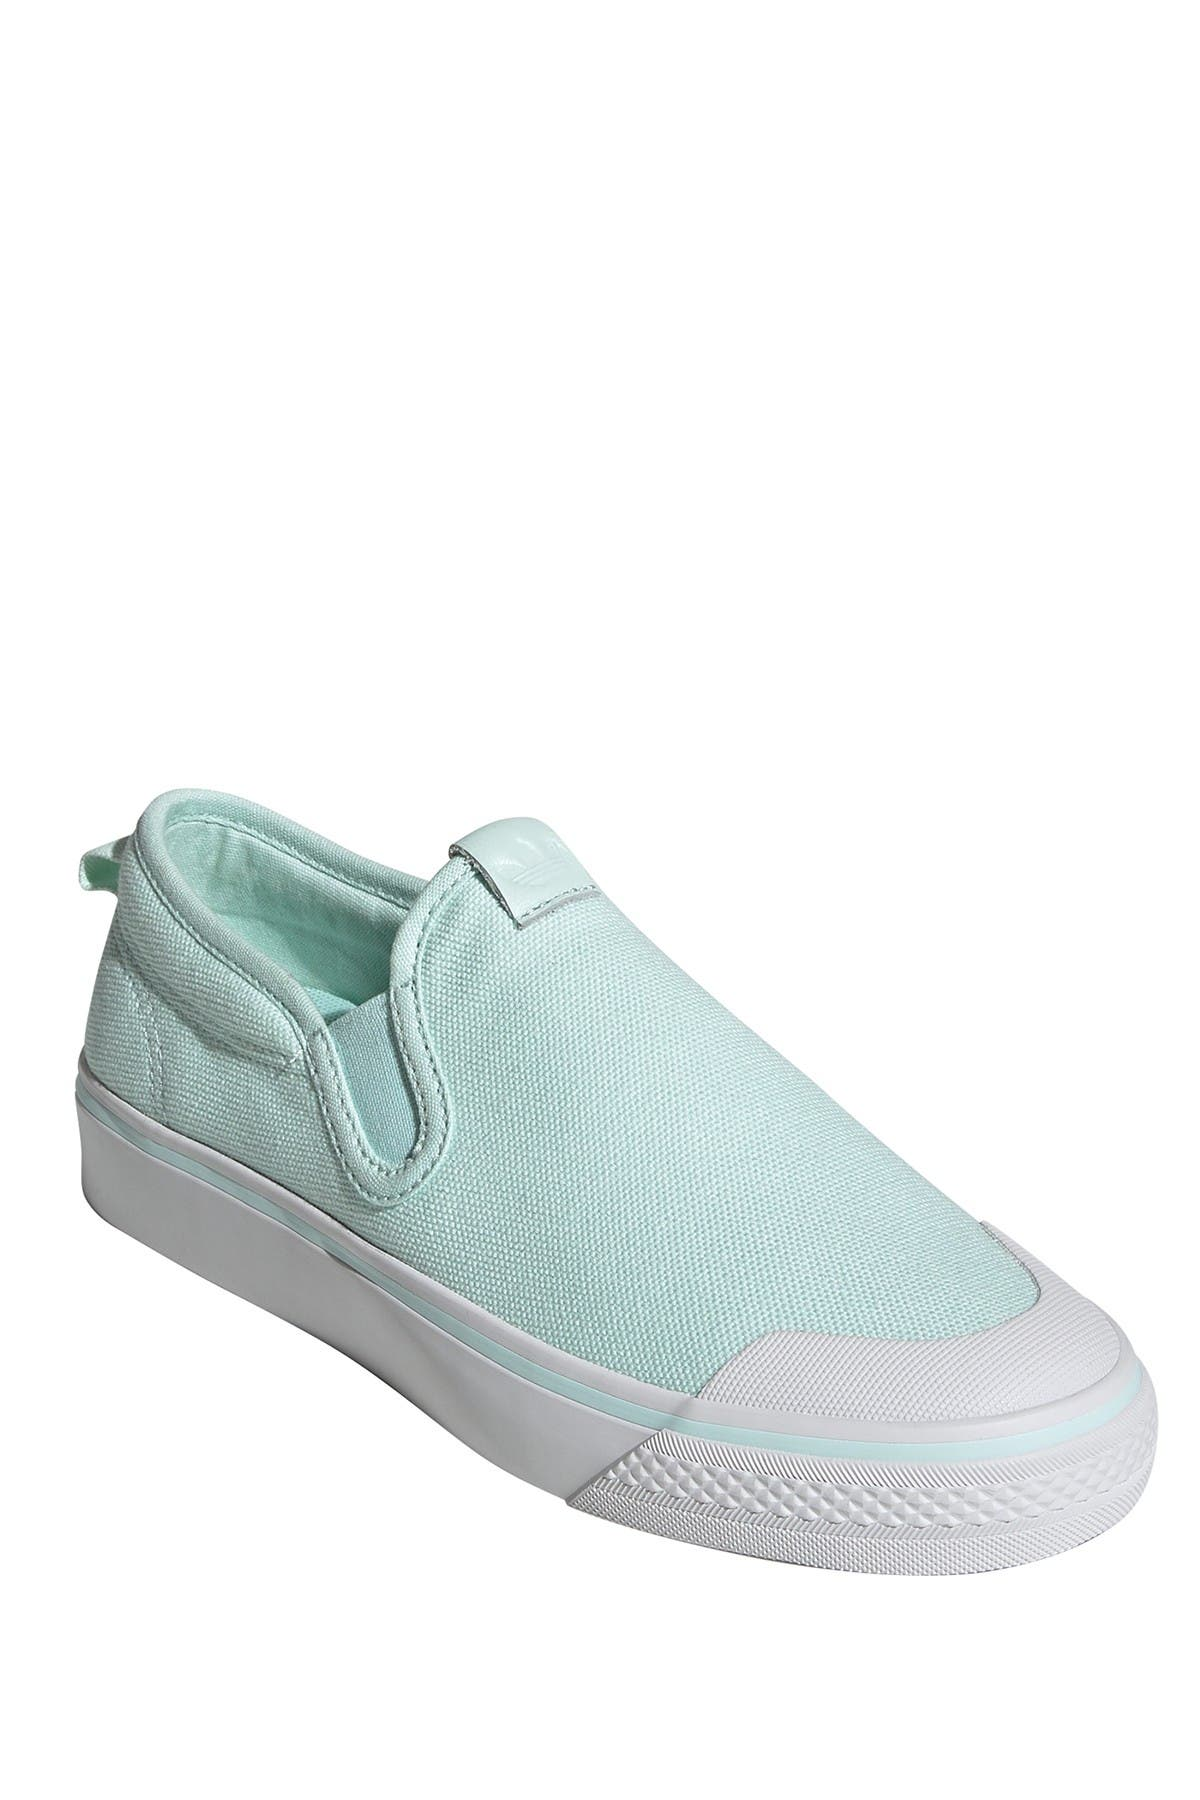 adidas | Nizza Slip-On Sneaker